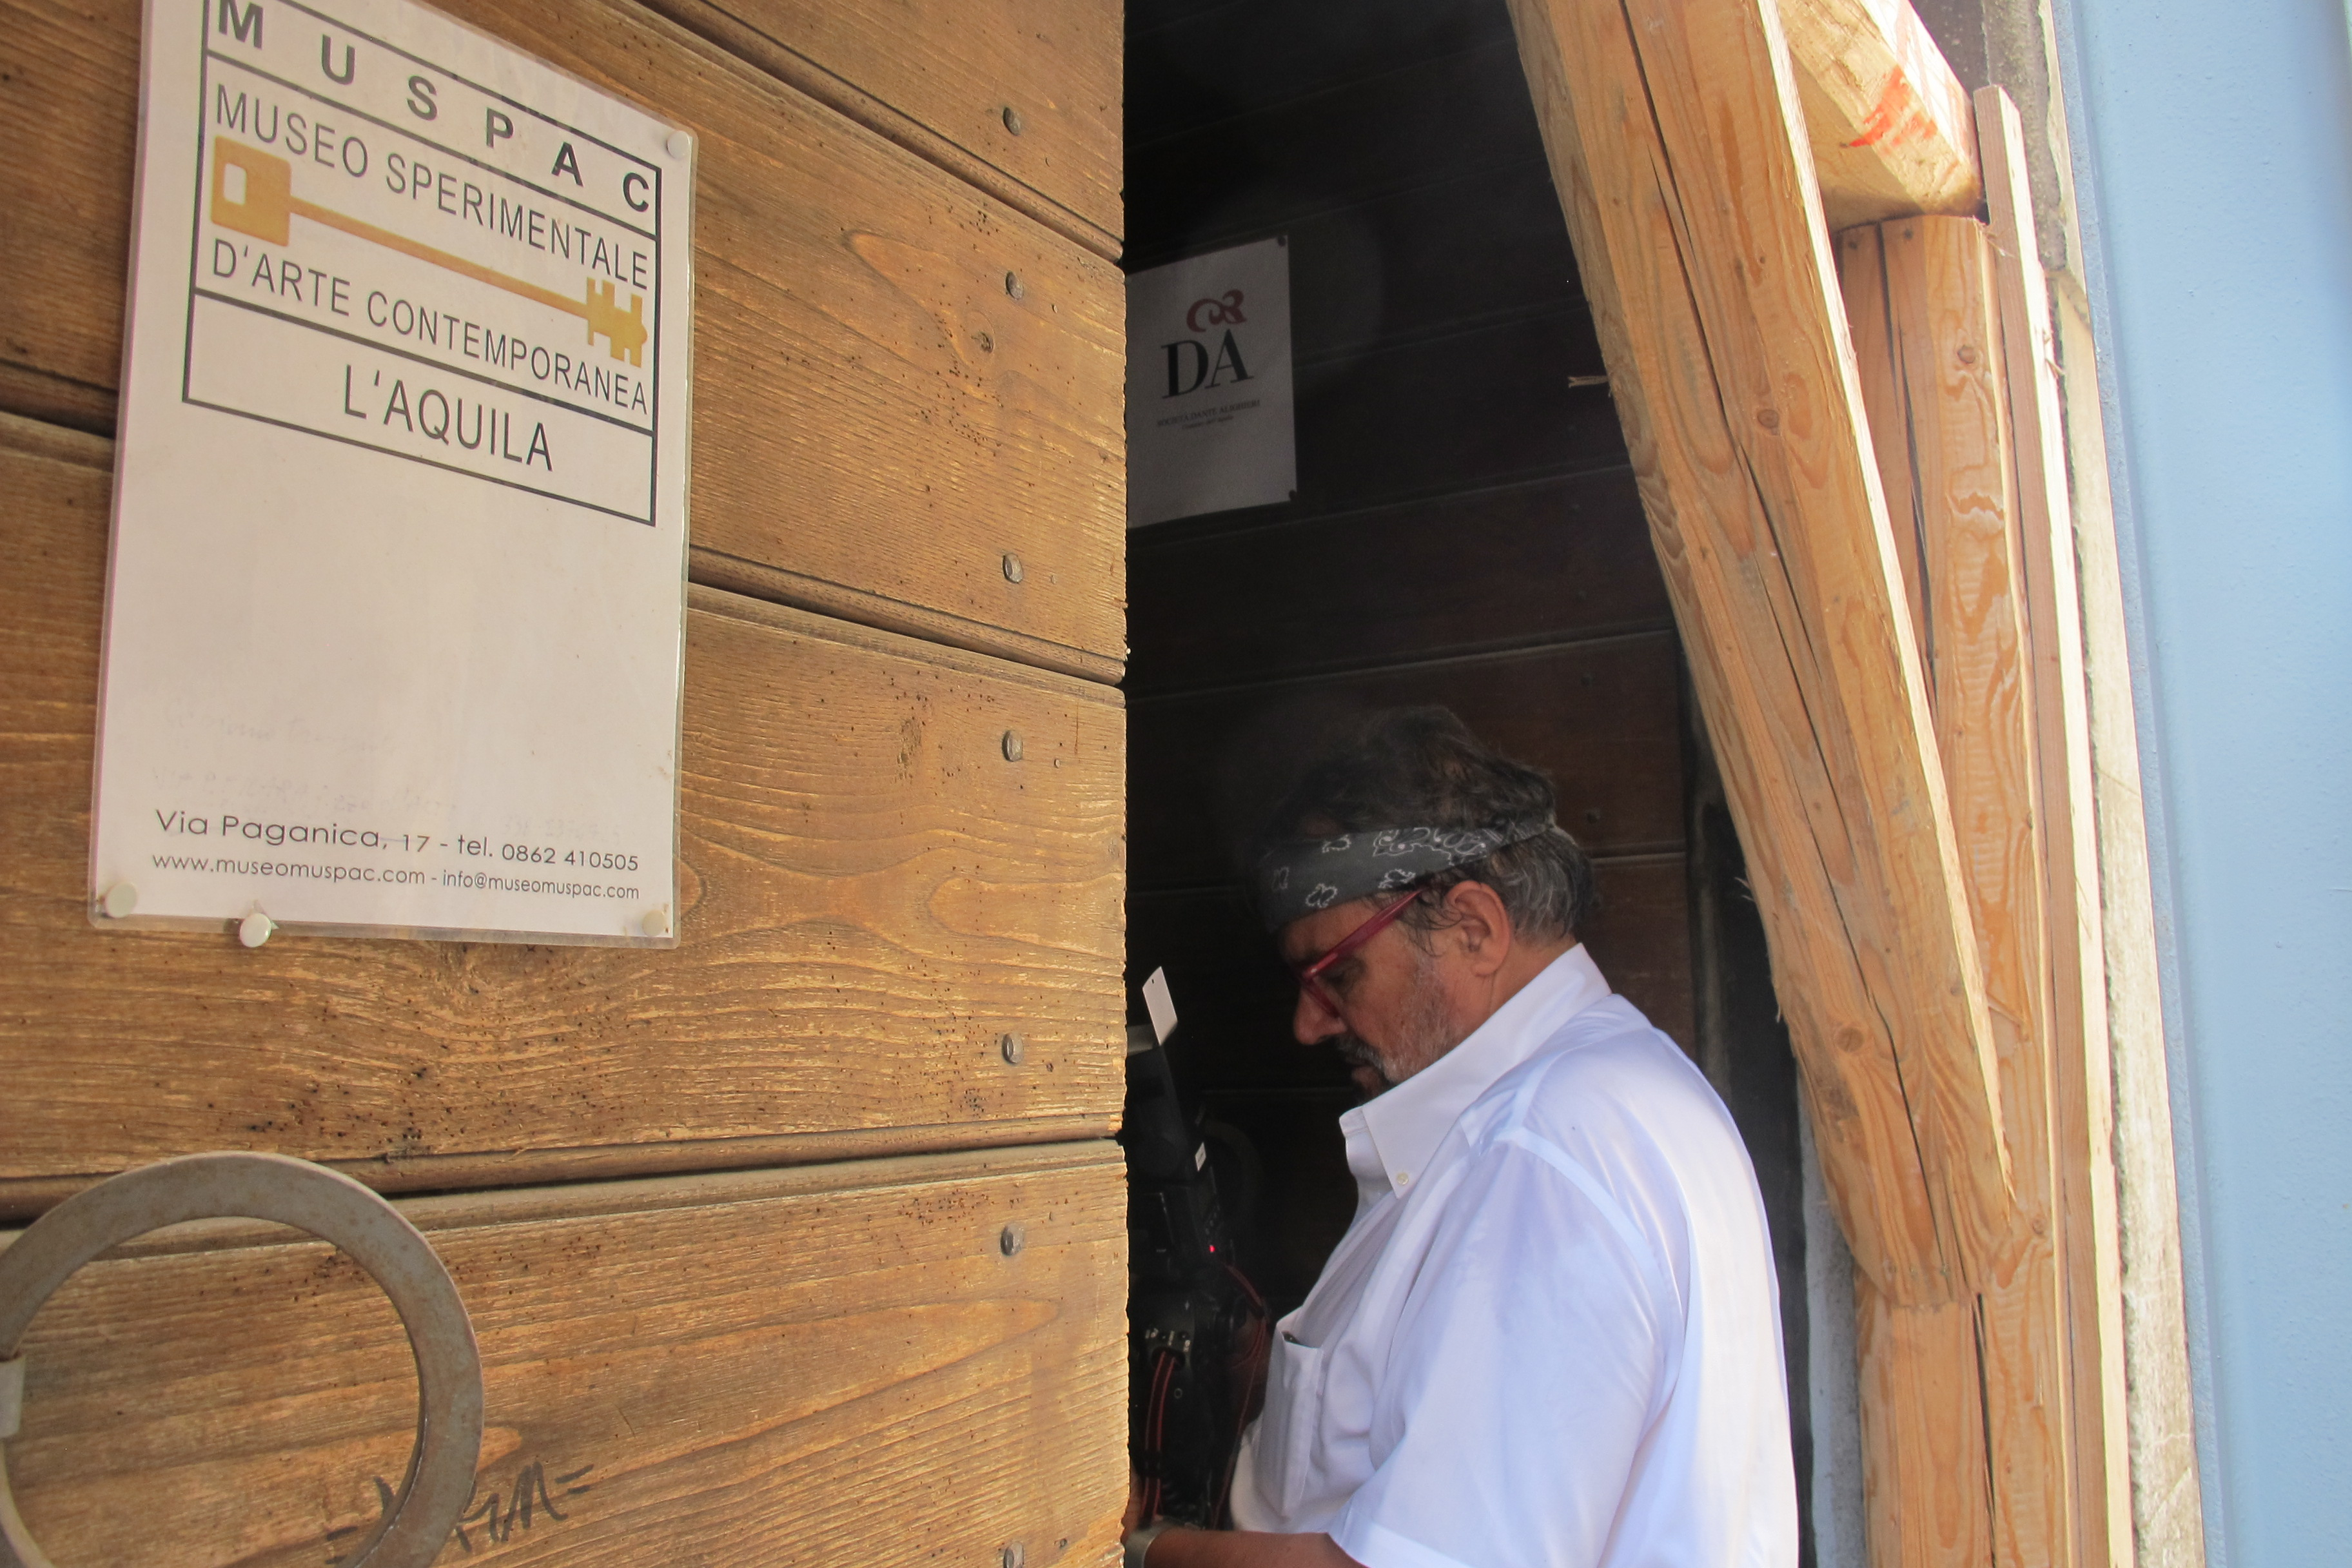 Oliviero Toscani nella sede del Muspac